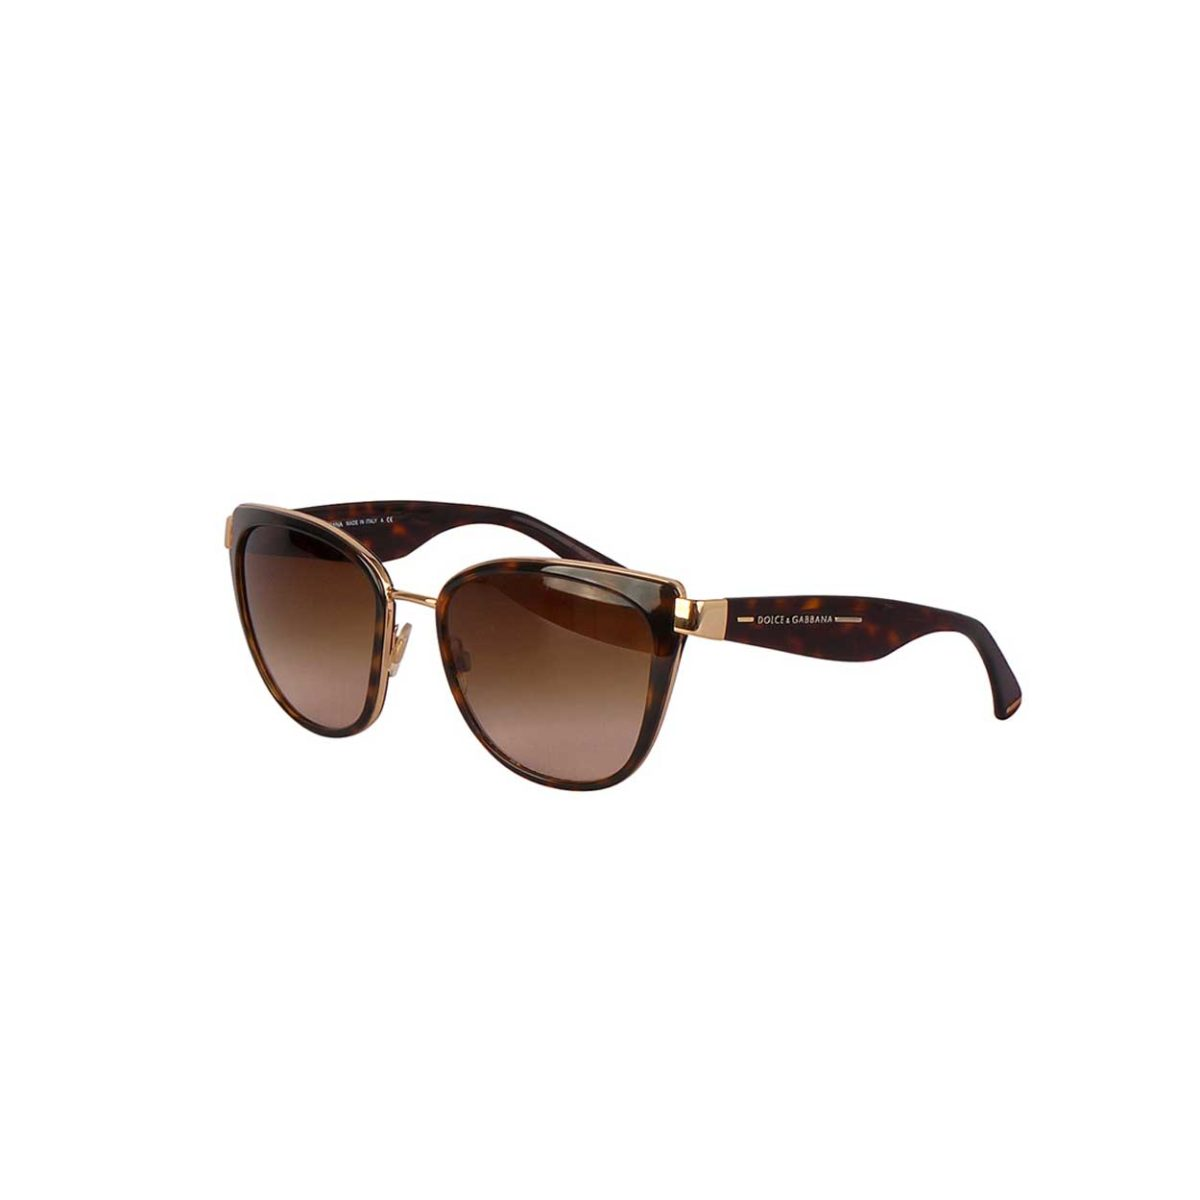 64a03e5d105 DOLCE   GABBANA Sunglasses DG2107 - Luxity